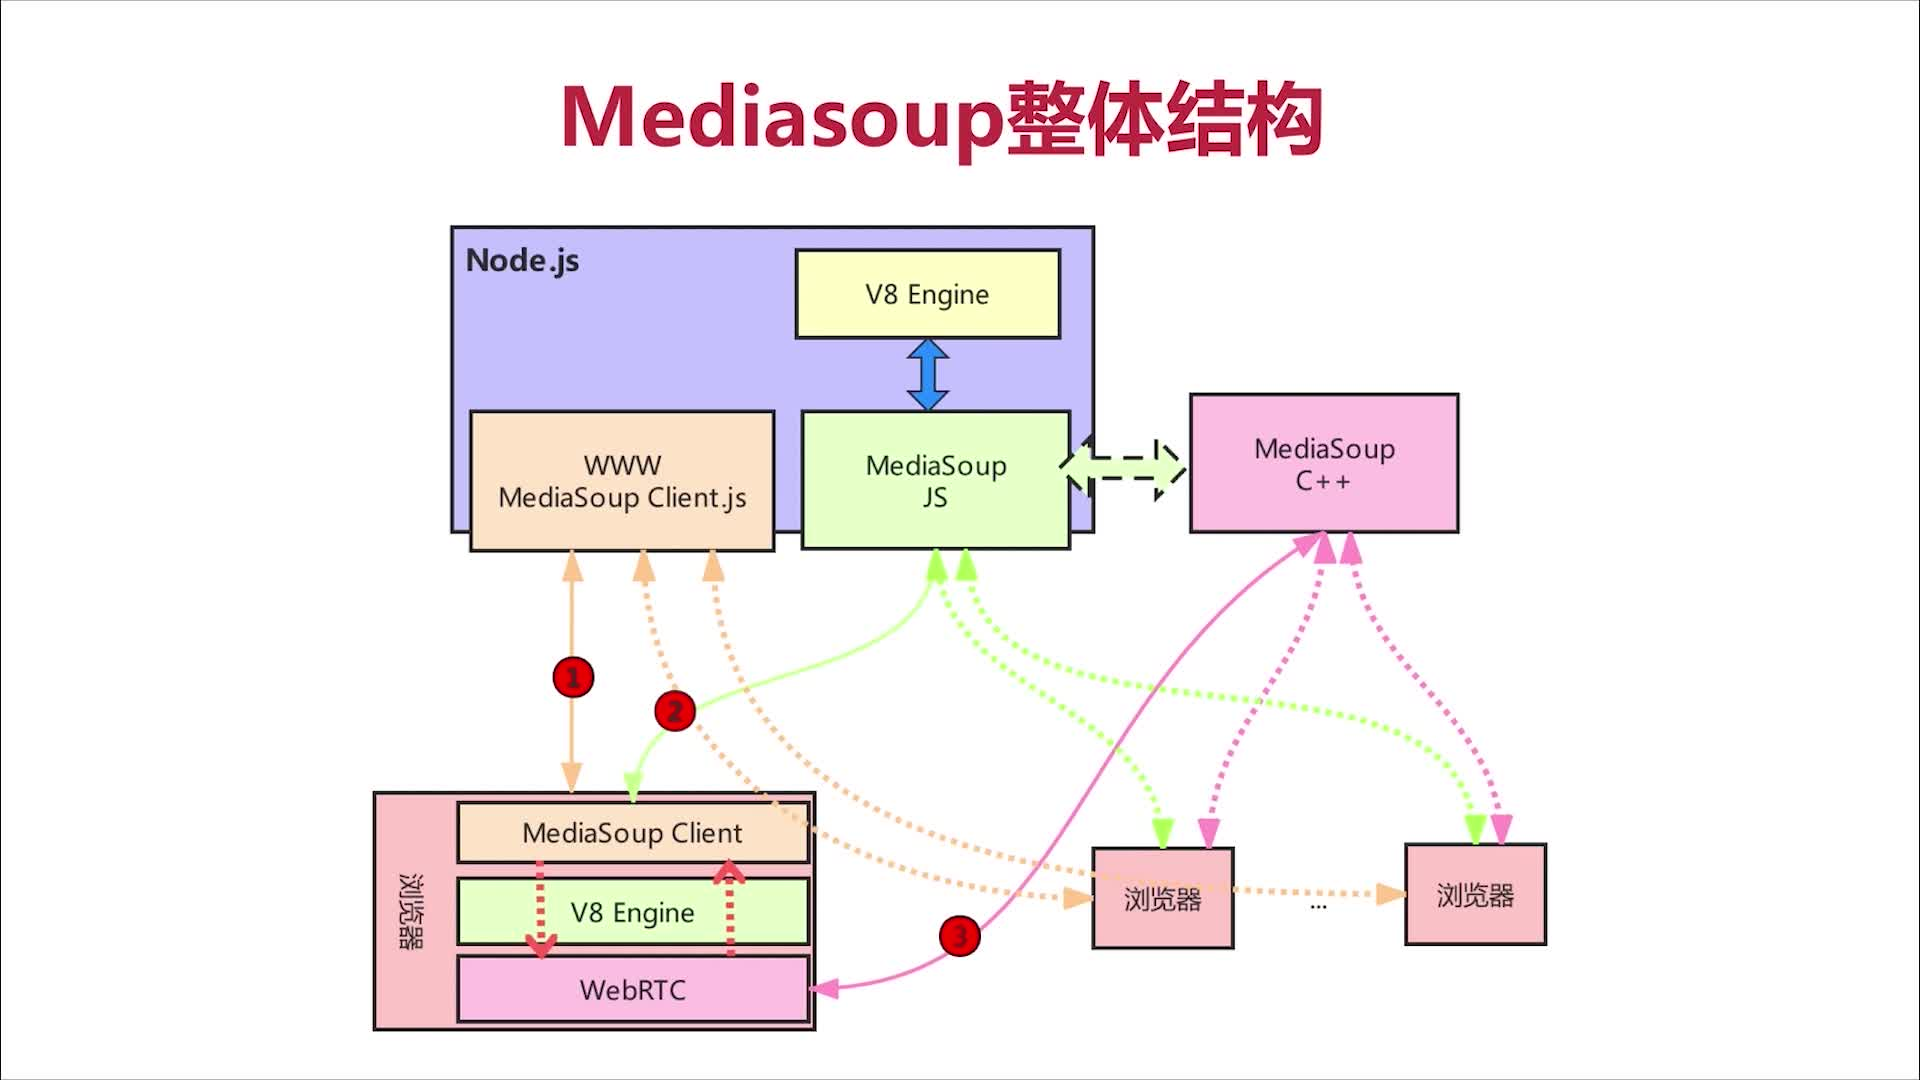 Mediasoup整体结构